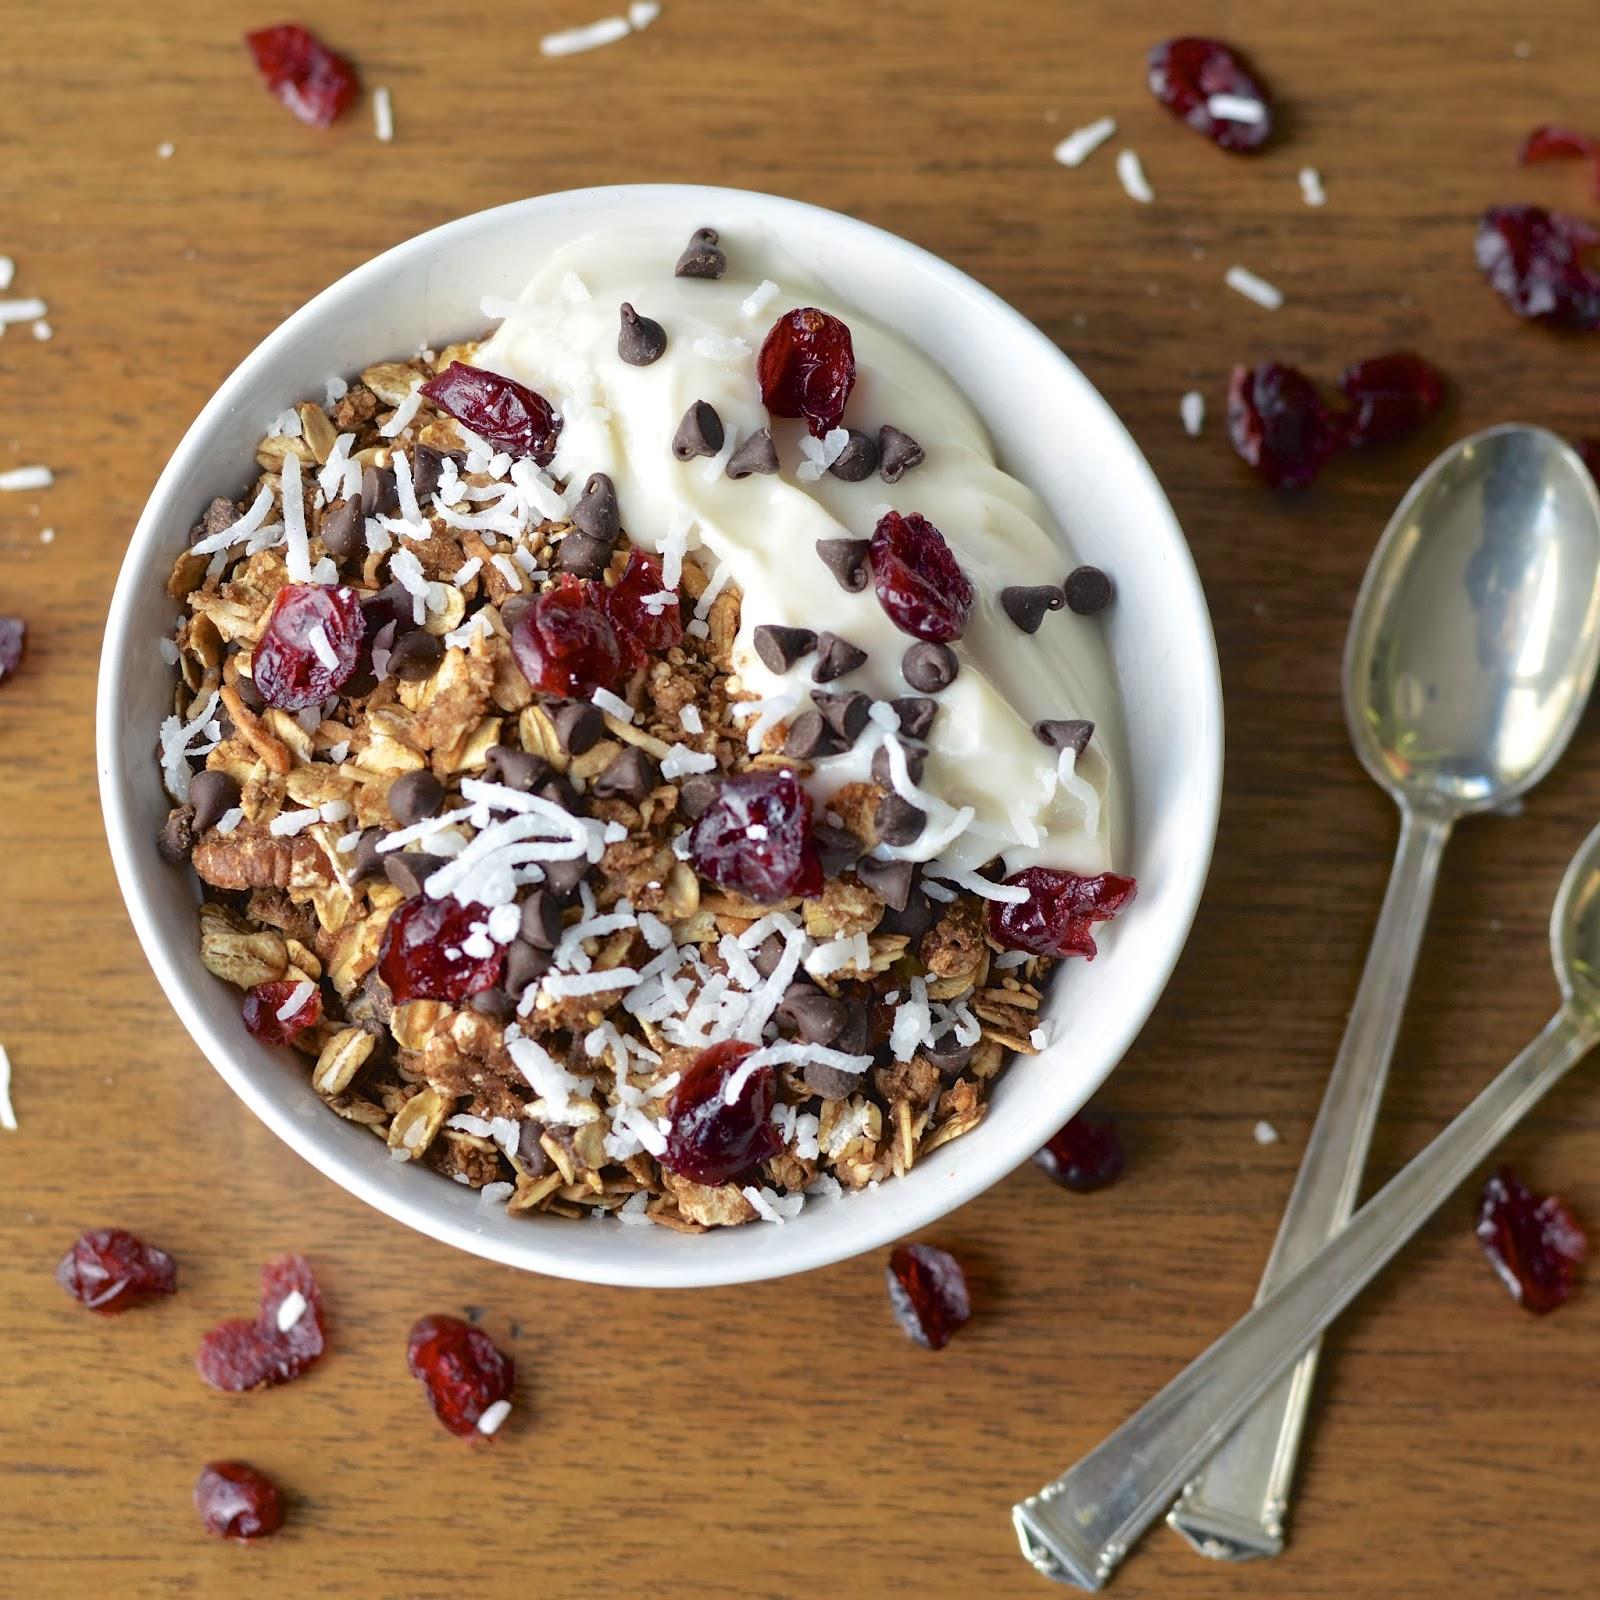 ... Yogurt Sundae | Virtually Homemade: Chocolate Cranberry Yogurt Sundae